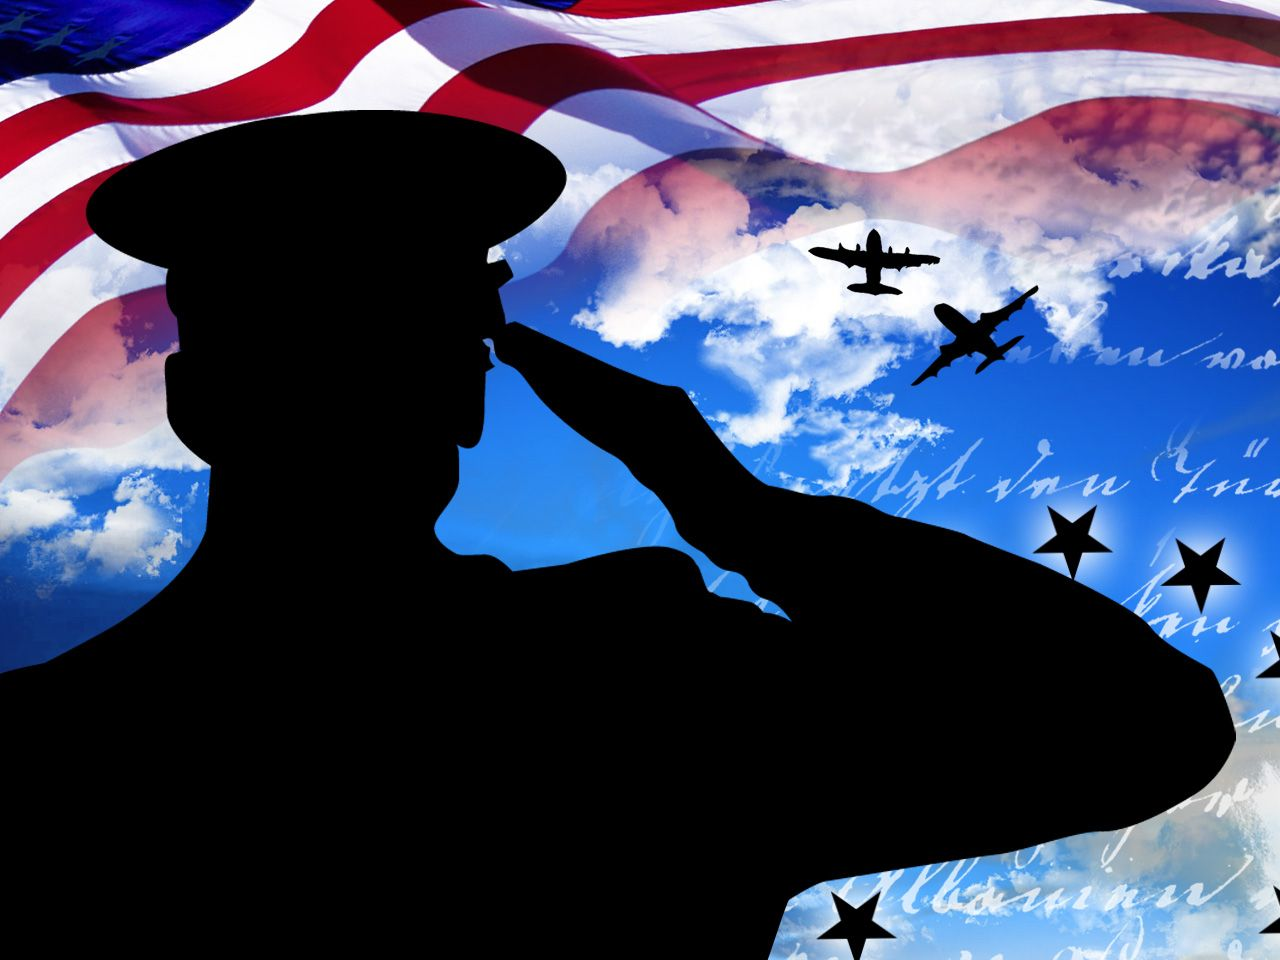 Usa symbols silhouette beautiful veterans day wallpaper made usa symbols silhouette beautiful veterans day wallpaper made from a coloage of photograph biocorpaavc